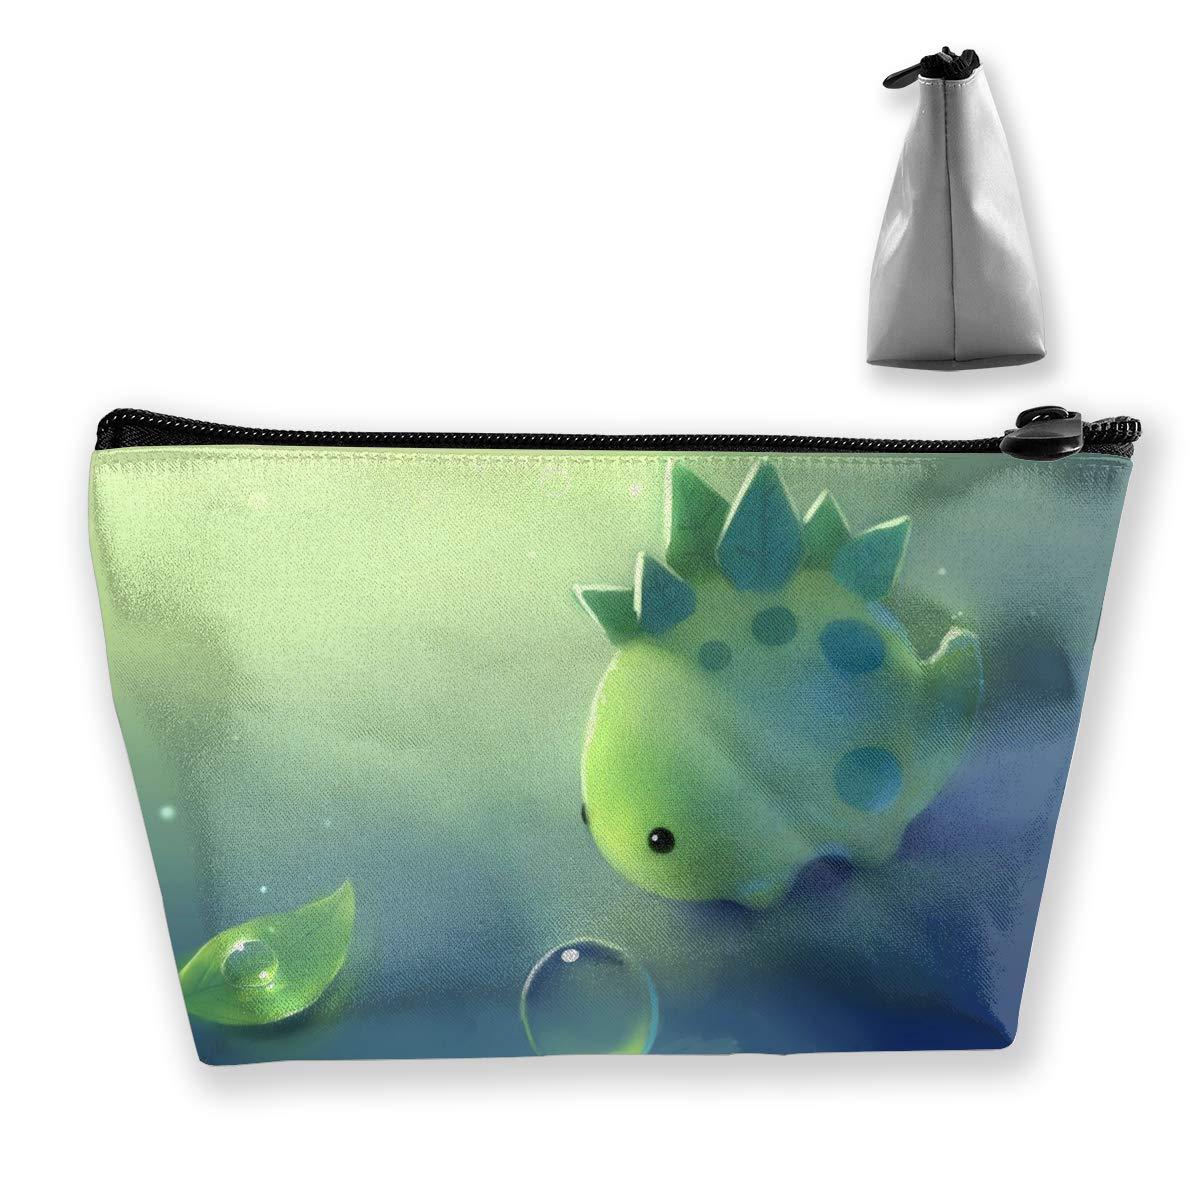 cd71cbe27113 Amazon.com: Create Magic - Cute Dinosaur Makeup Toiletry Bag Travel ...